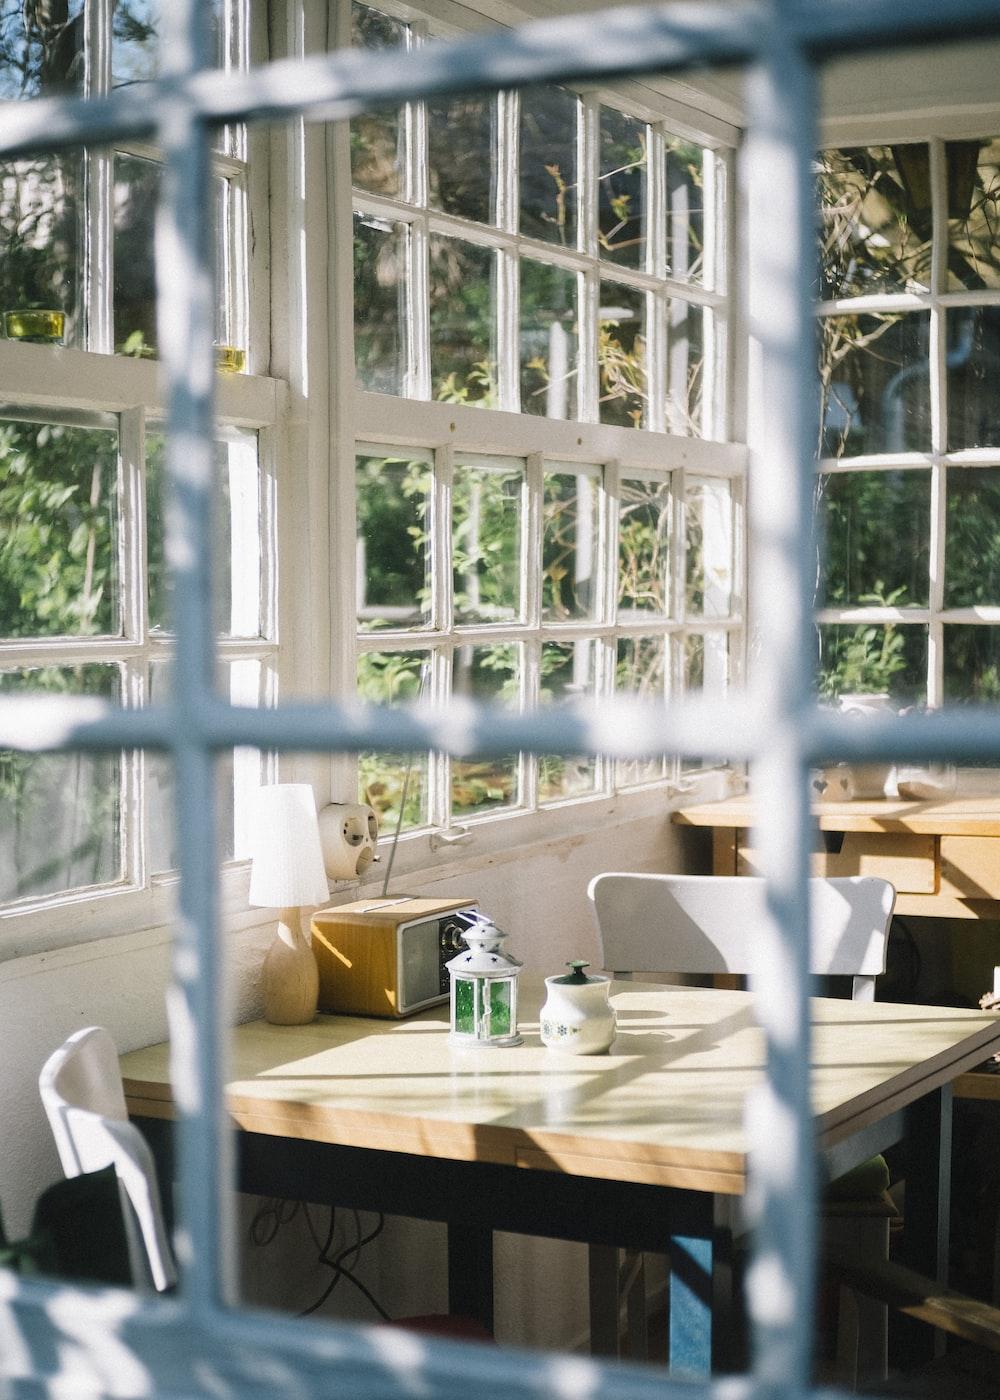 white wooden table near window